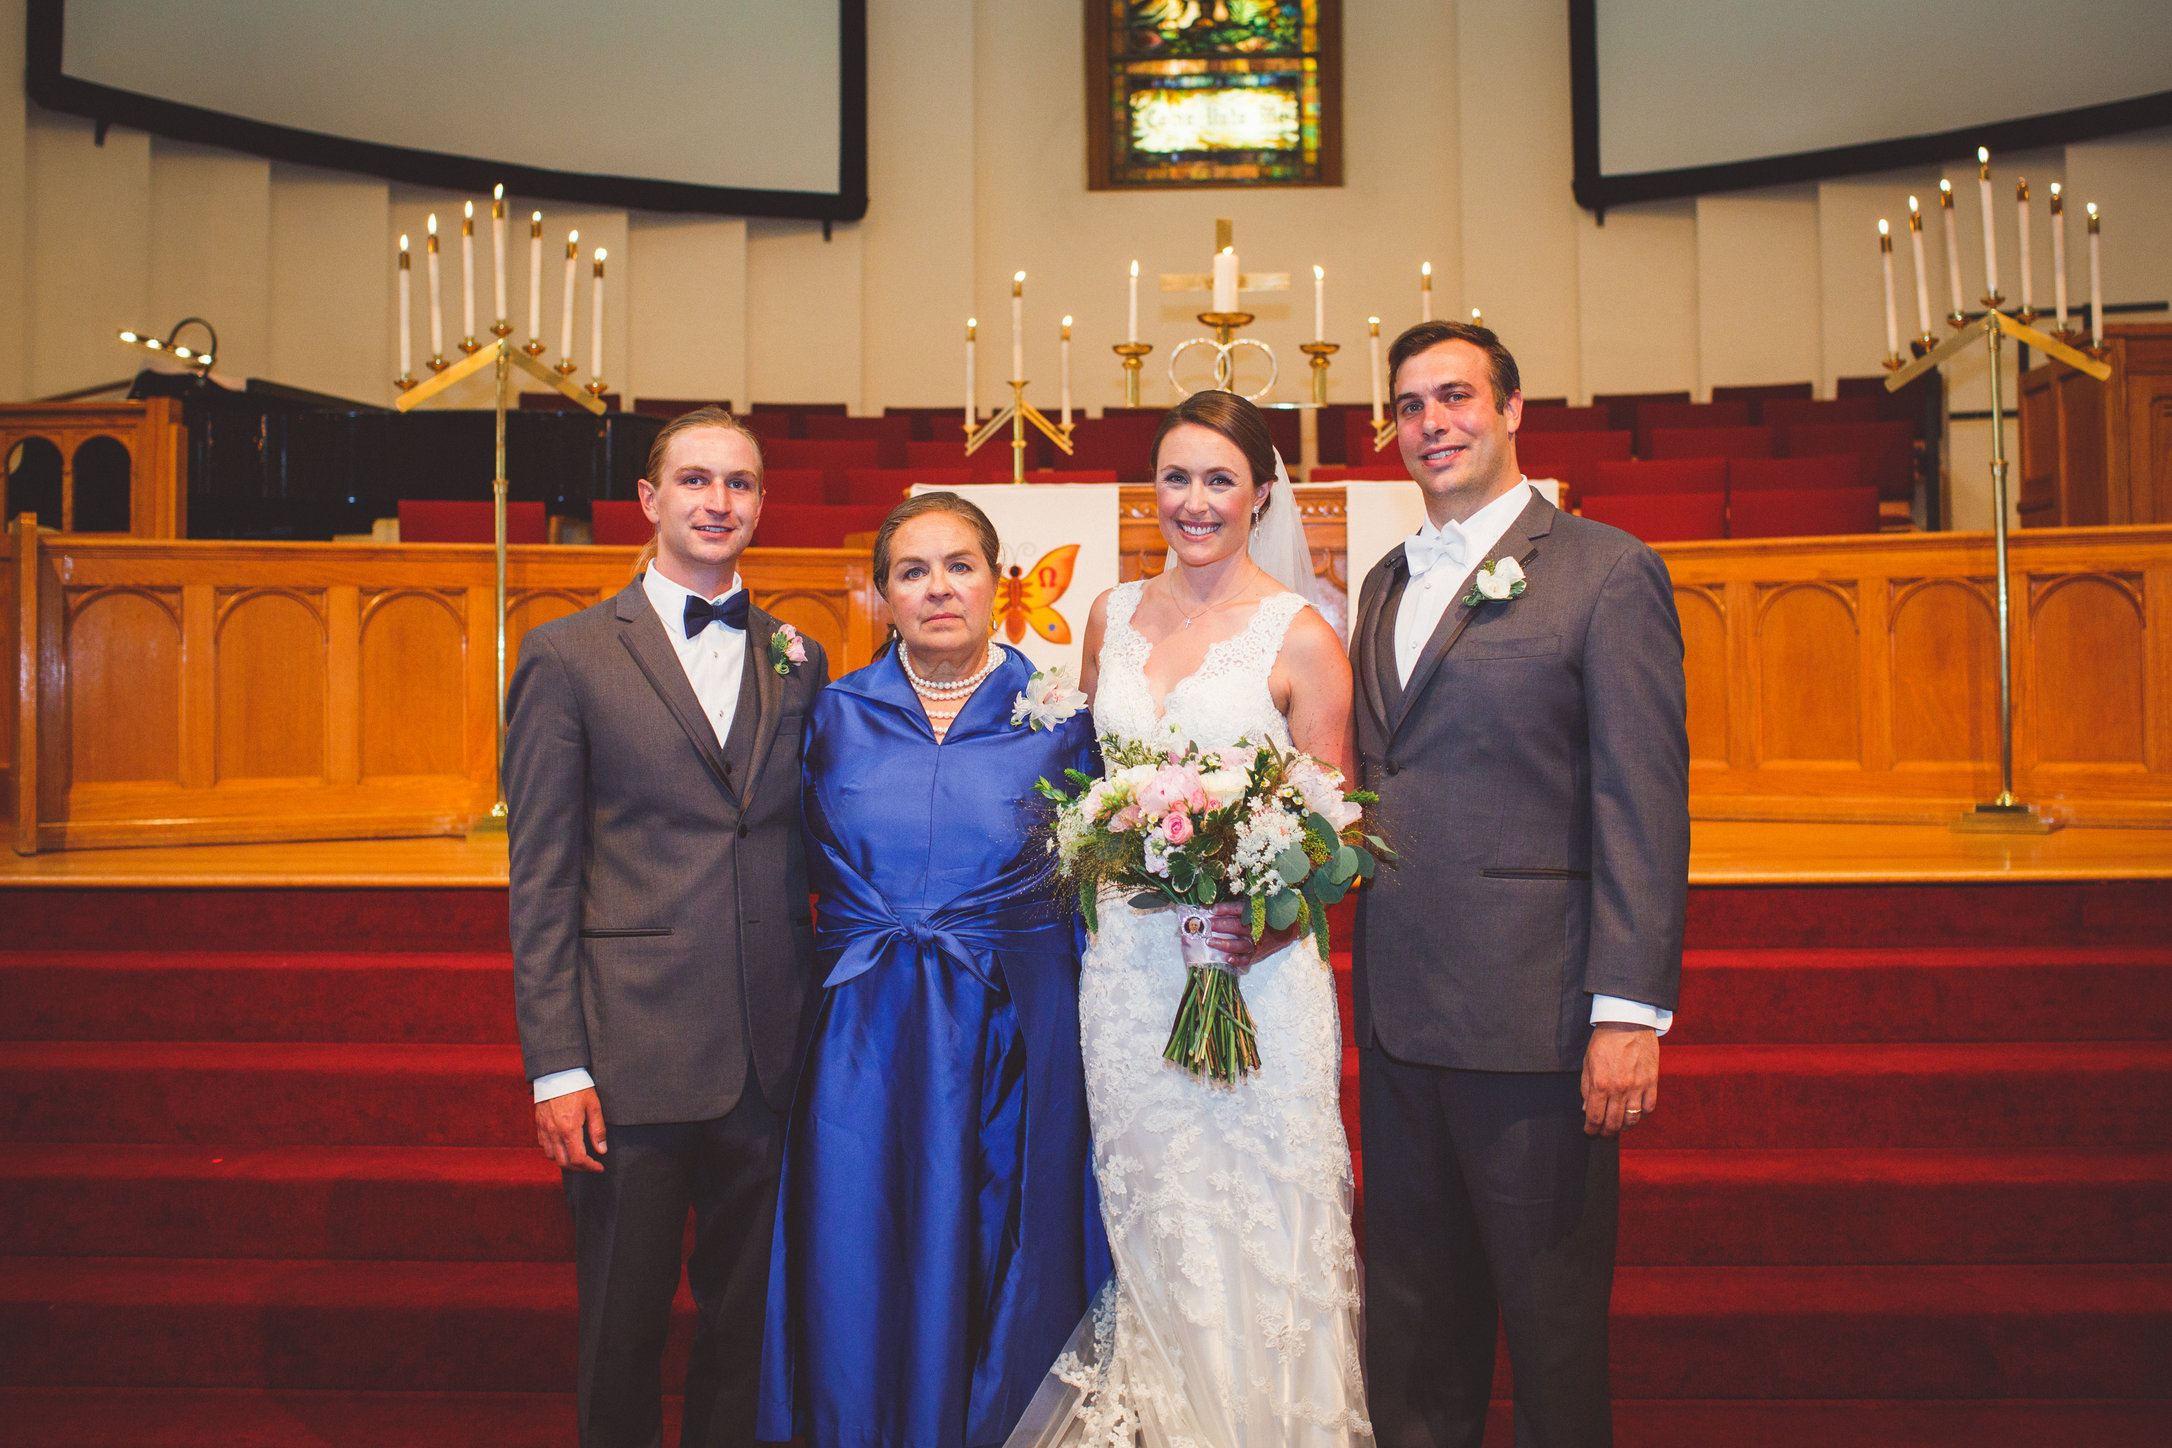 SandC-wedding-264.jpg